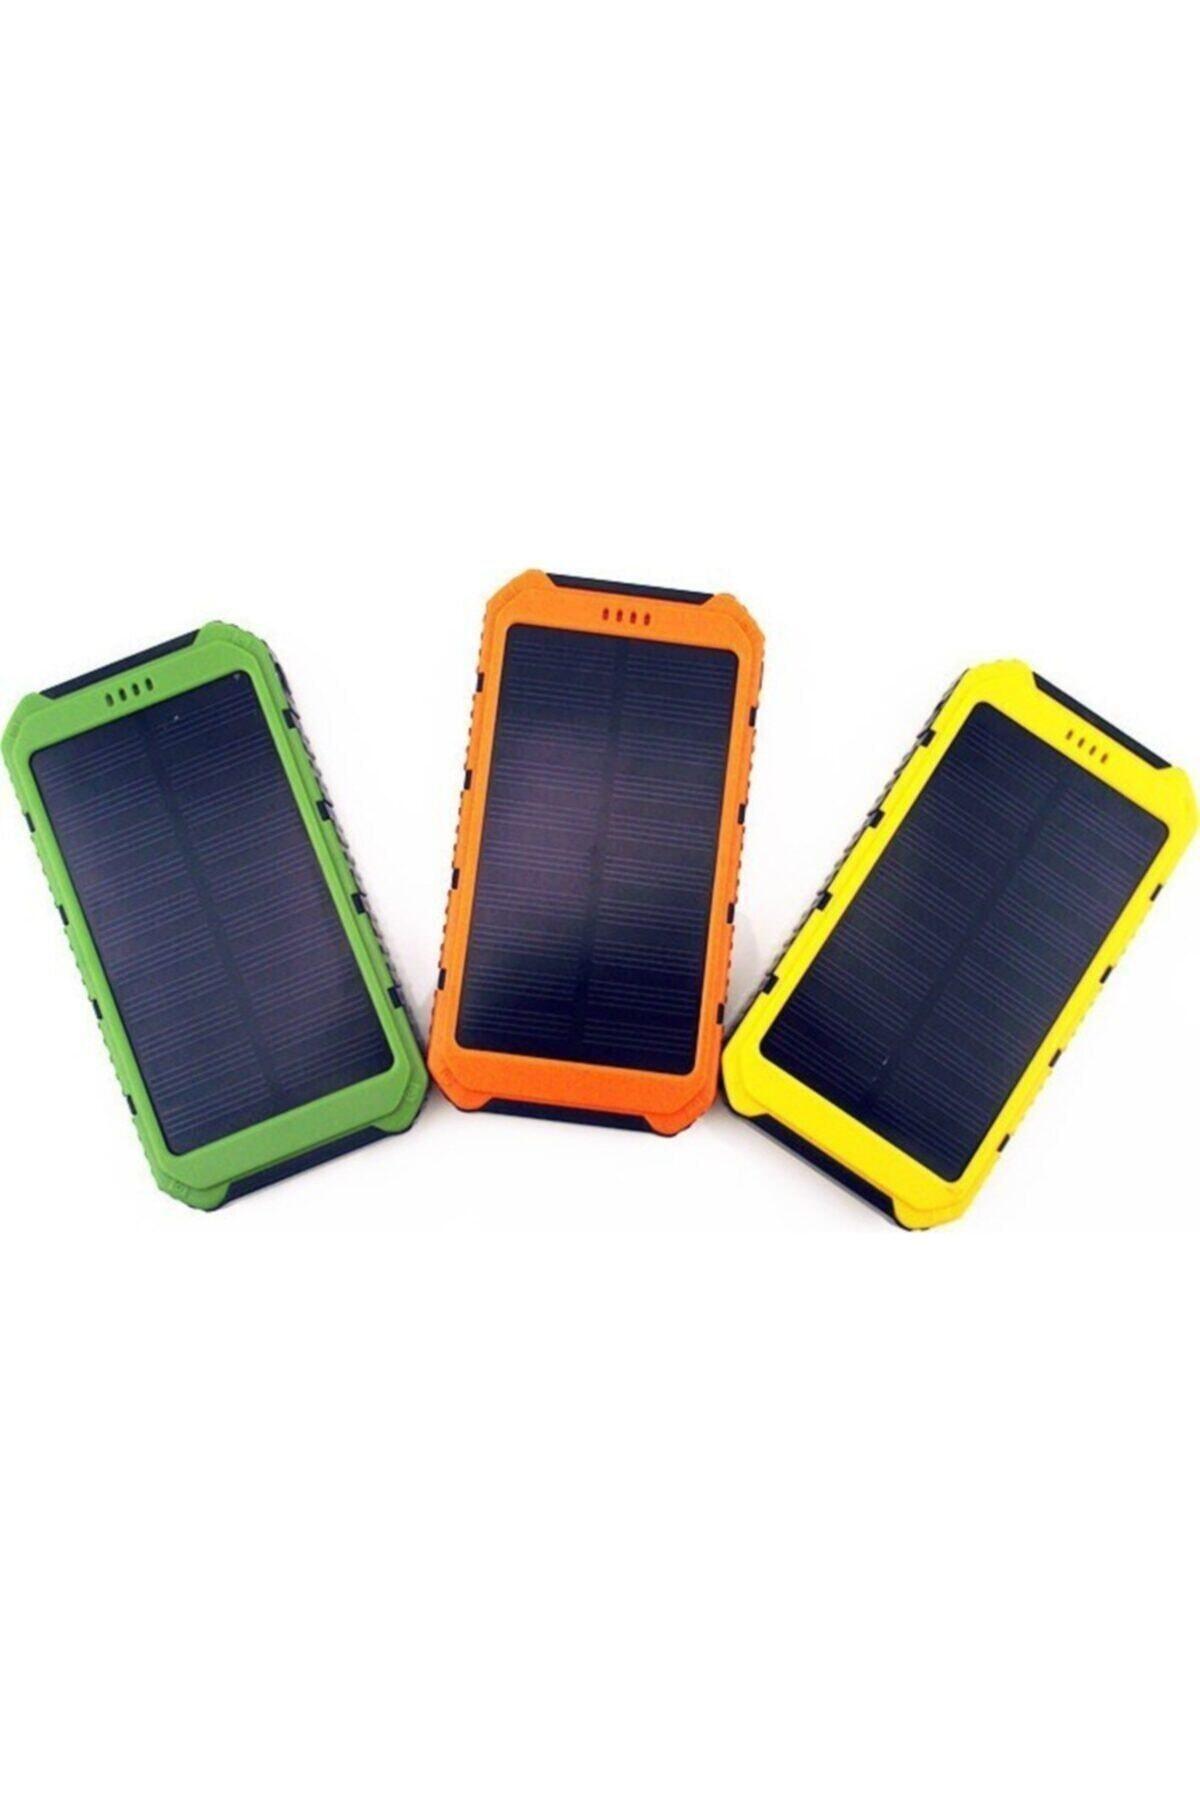 Arfseb Solar Güneş Enerjili 15000 Mah Taşınabilir Şarj Cihazı - Powerbank